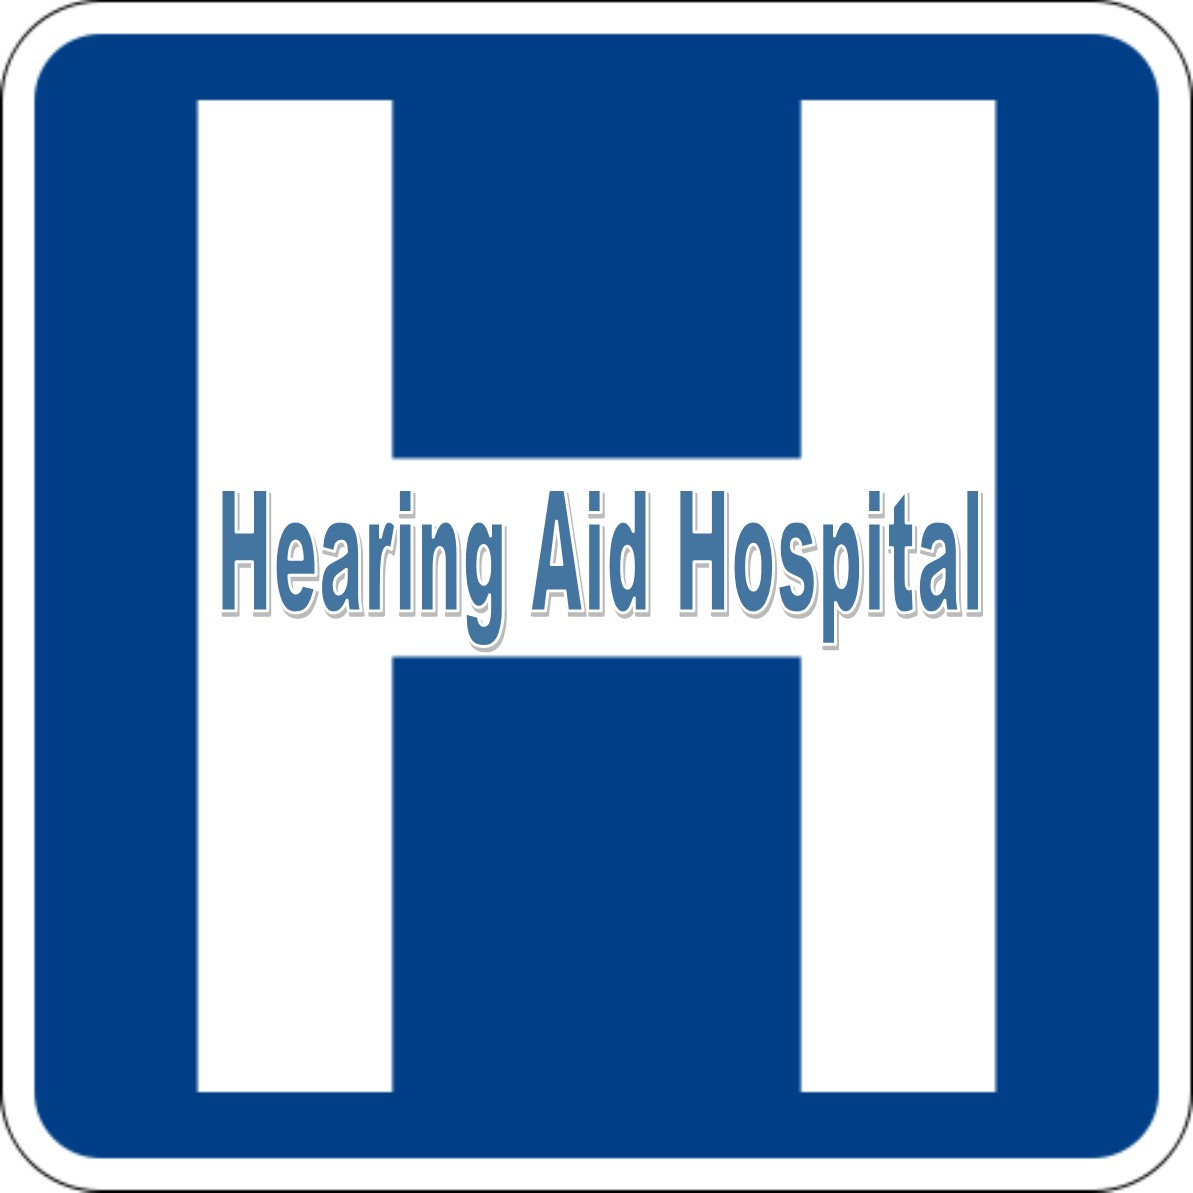 Hearing Aid Hospital Sign.jpg